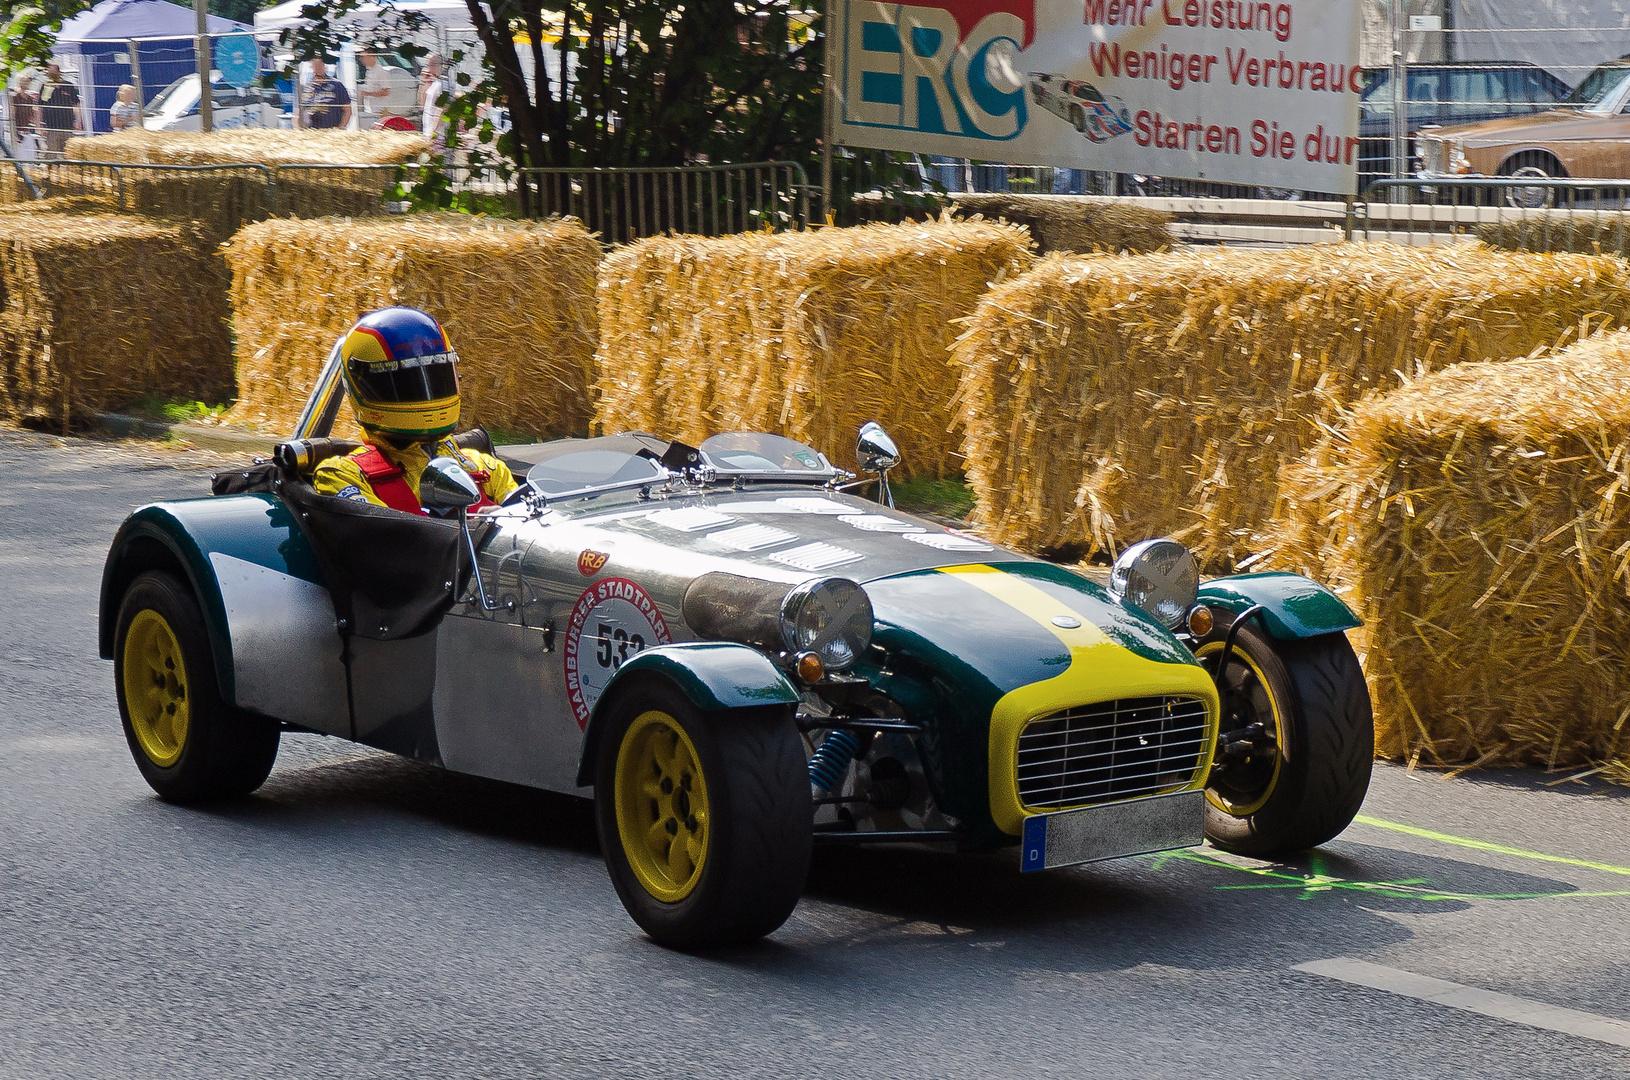 Lotus Super Seven S2 - Hamburger Stadtpark-Revival 2013